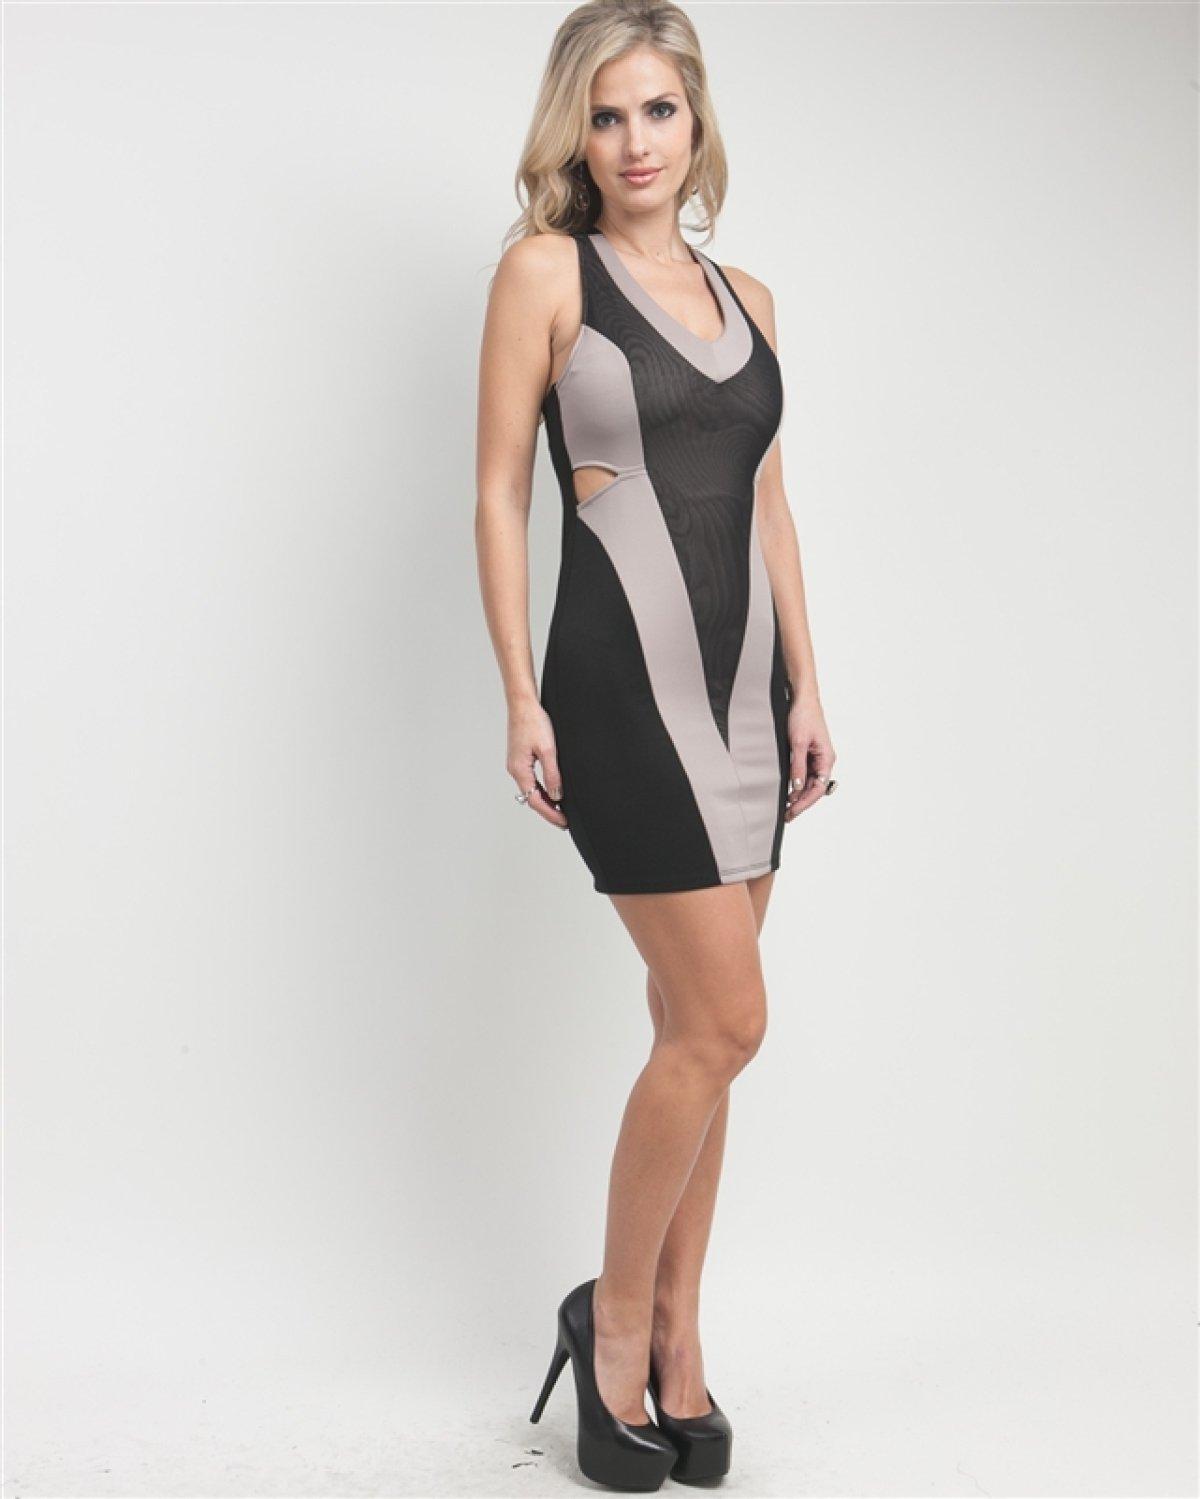 G2 Chic Crossback Colorblock Chevron Dress: